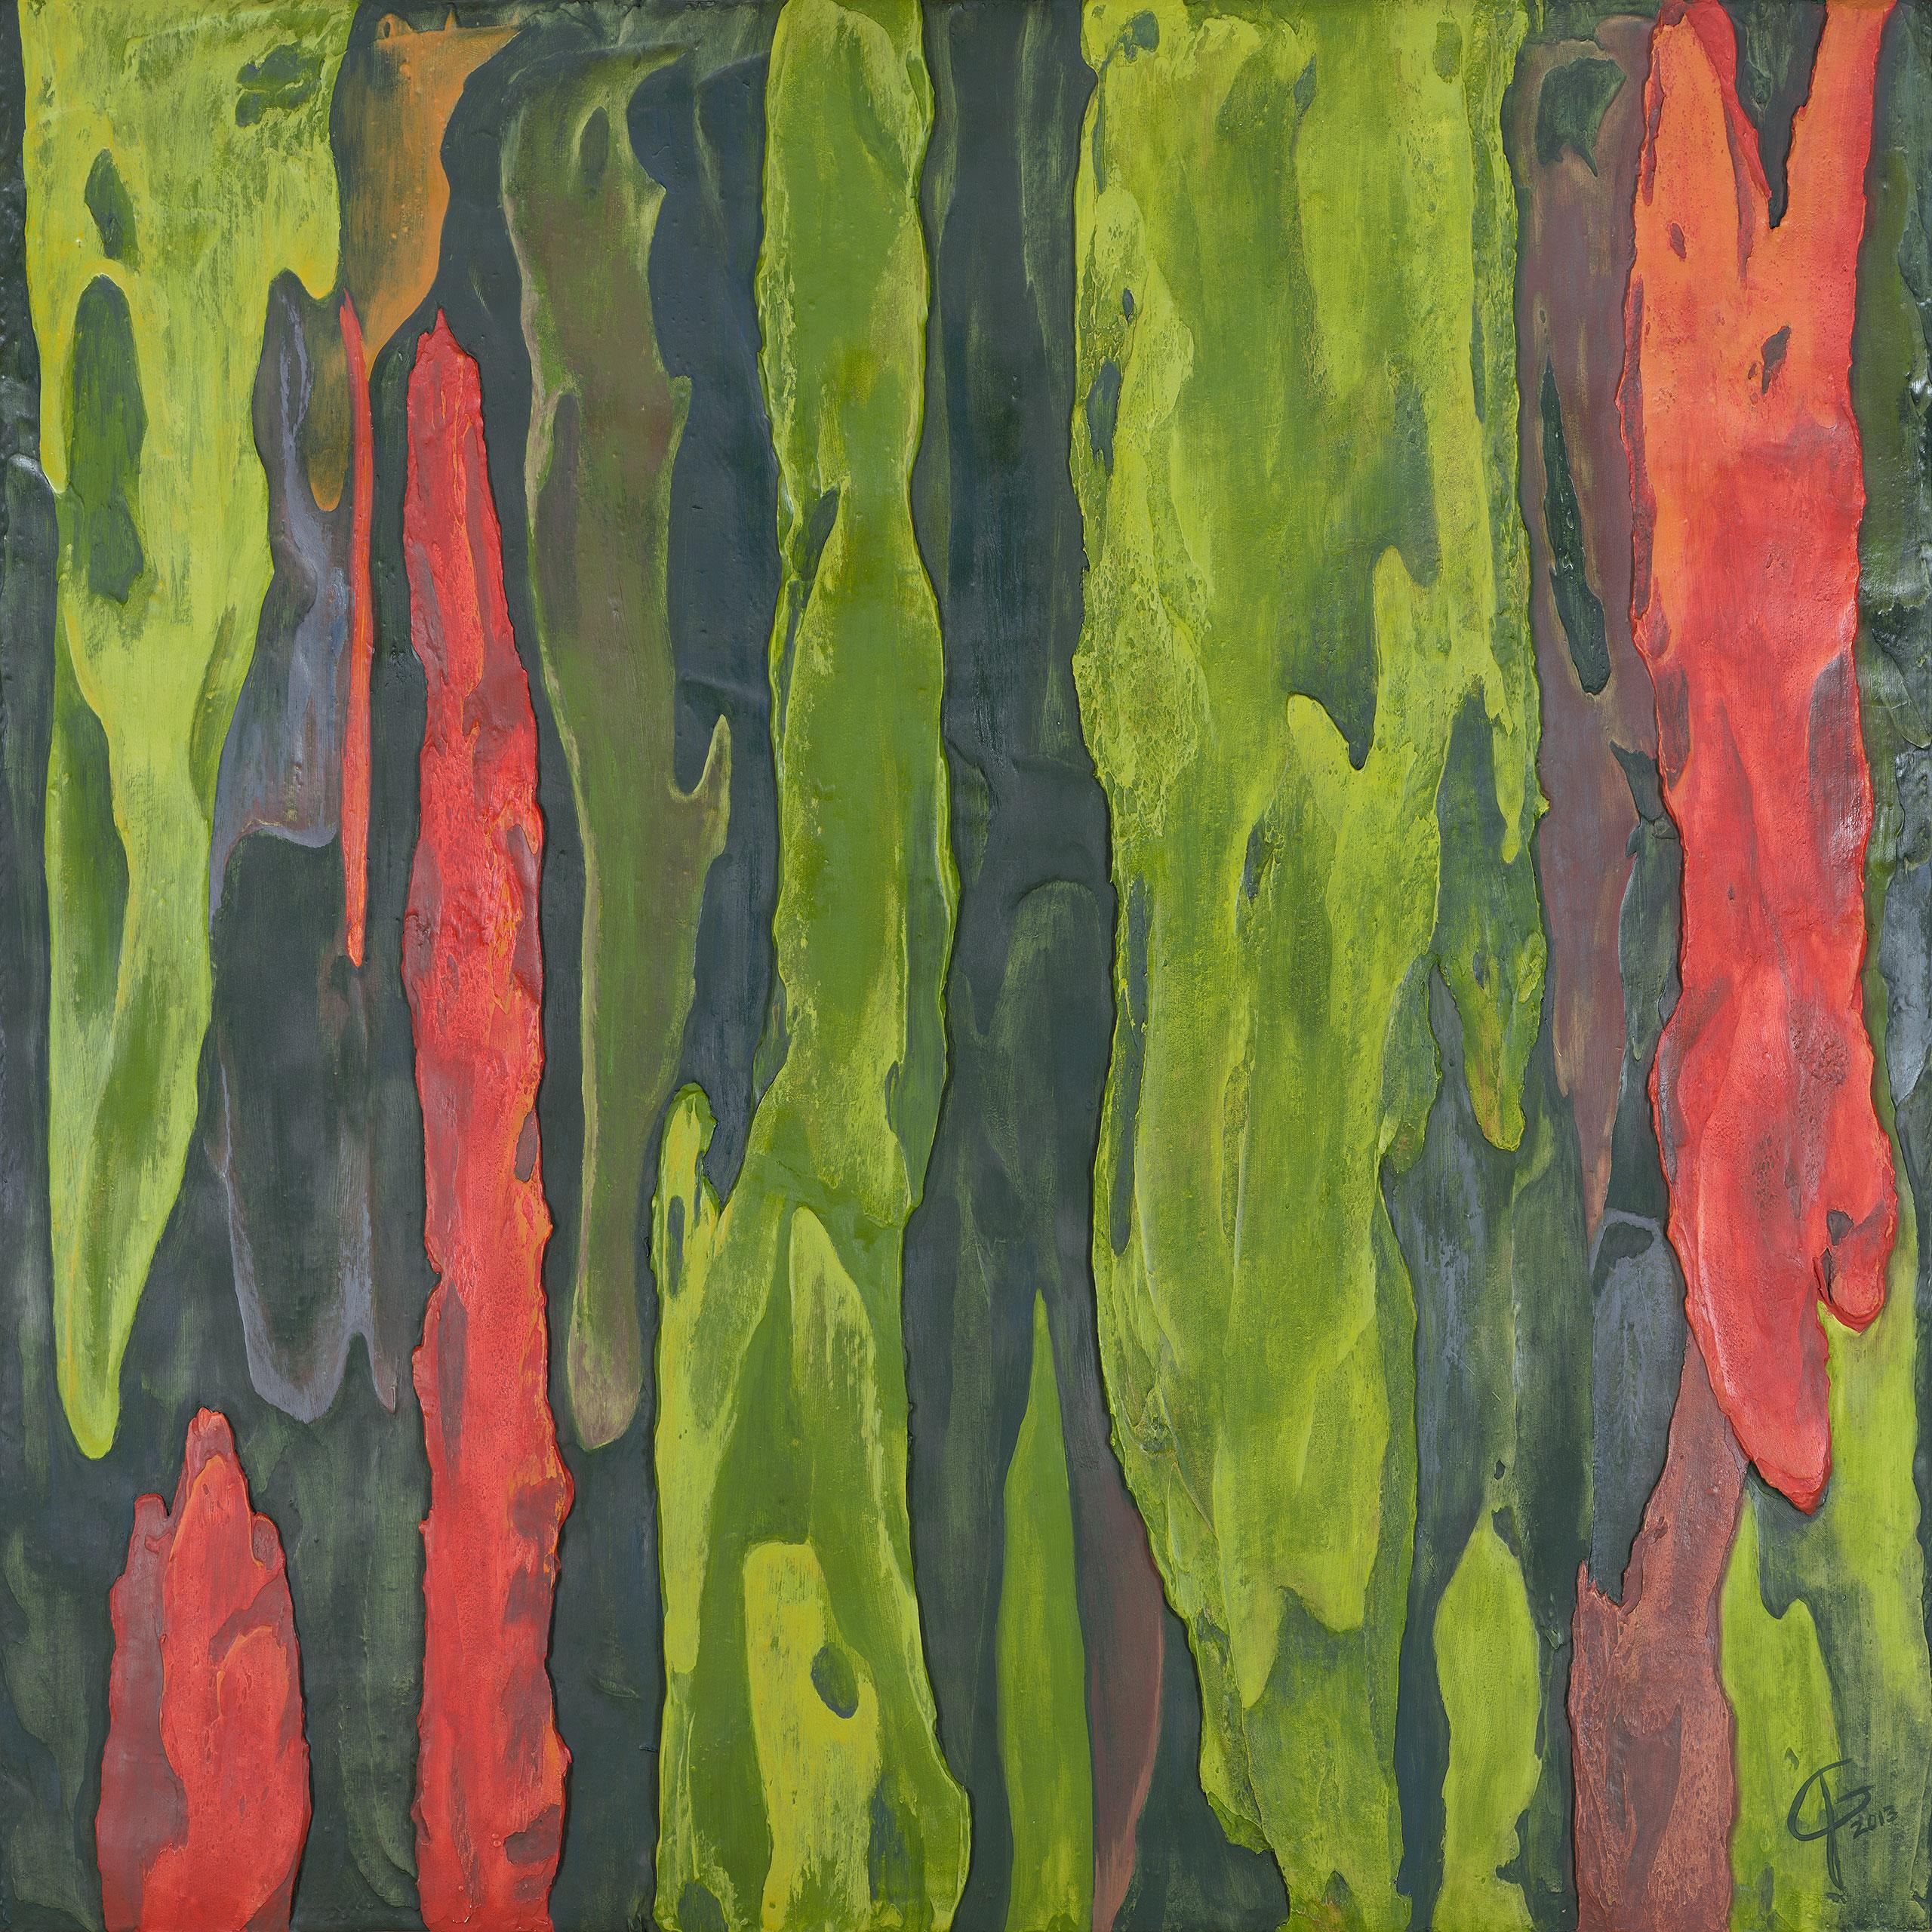 Wood Pallete v.03 by Jacqueline Gilmore